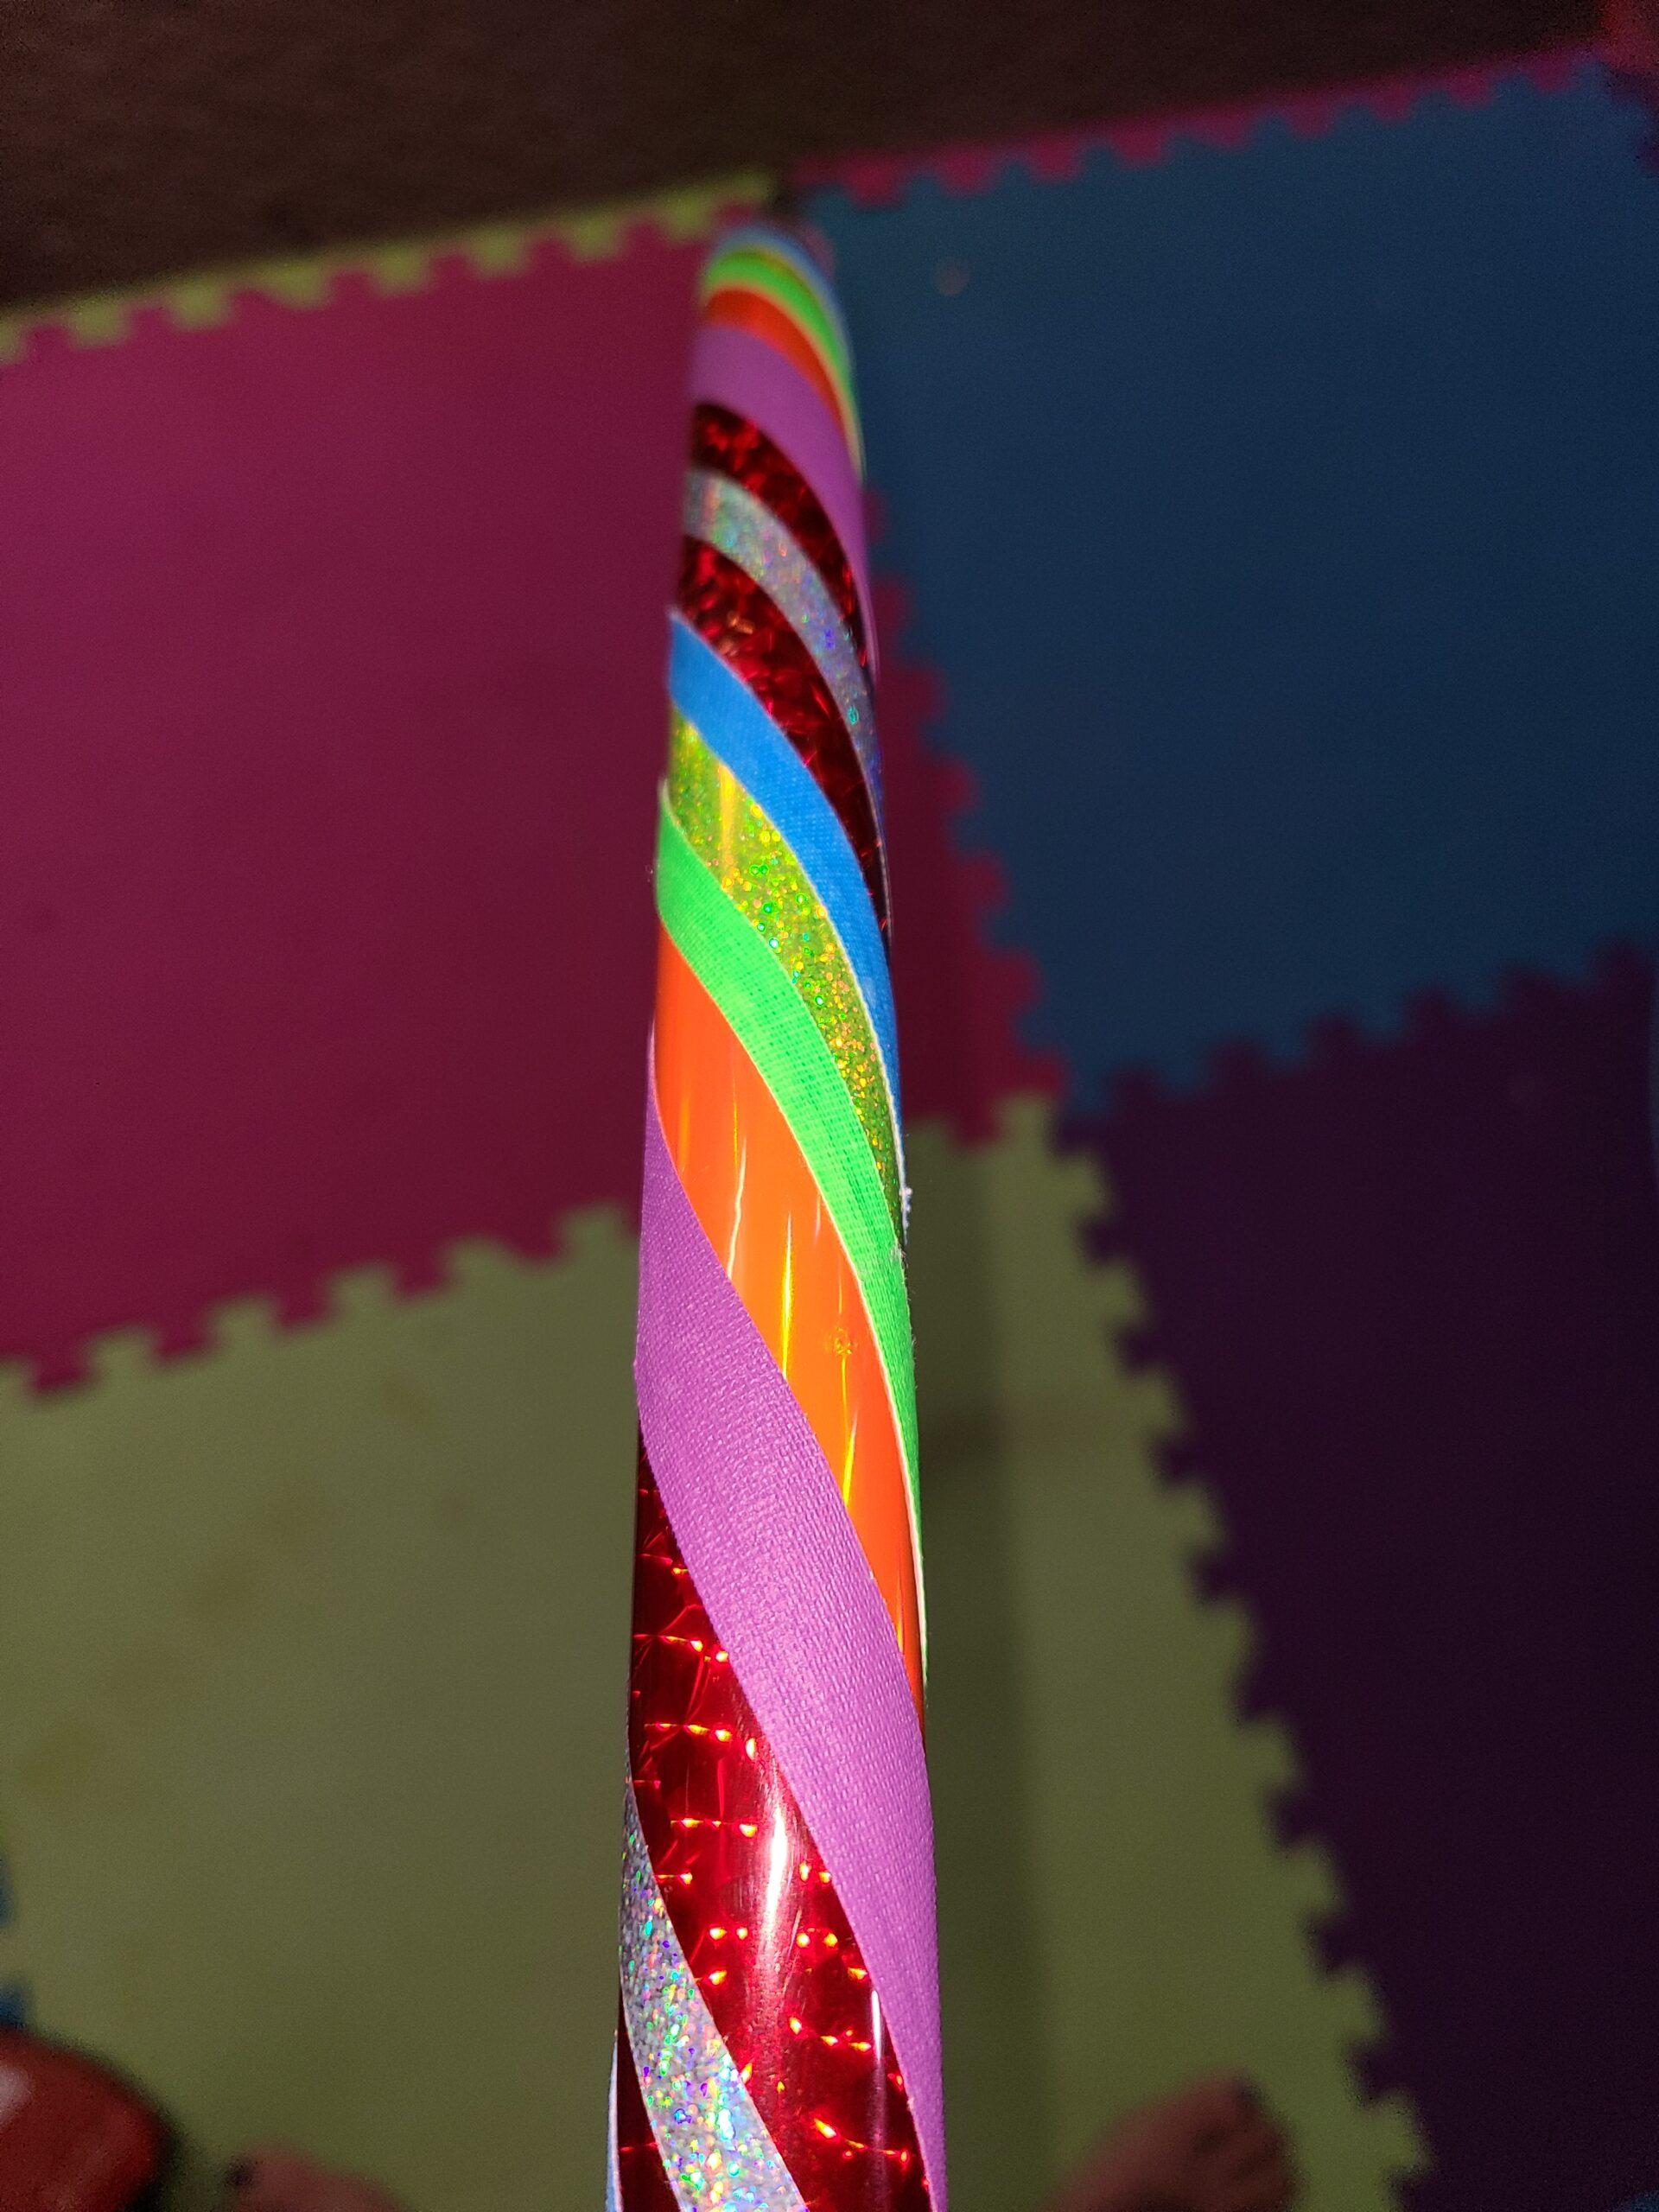 Rainbow hula hoop